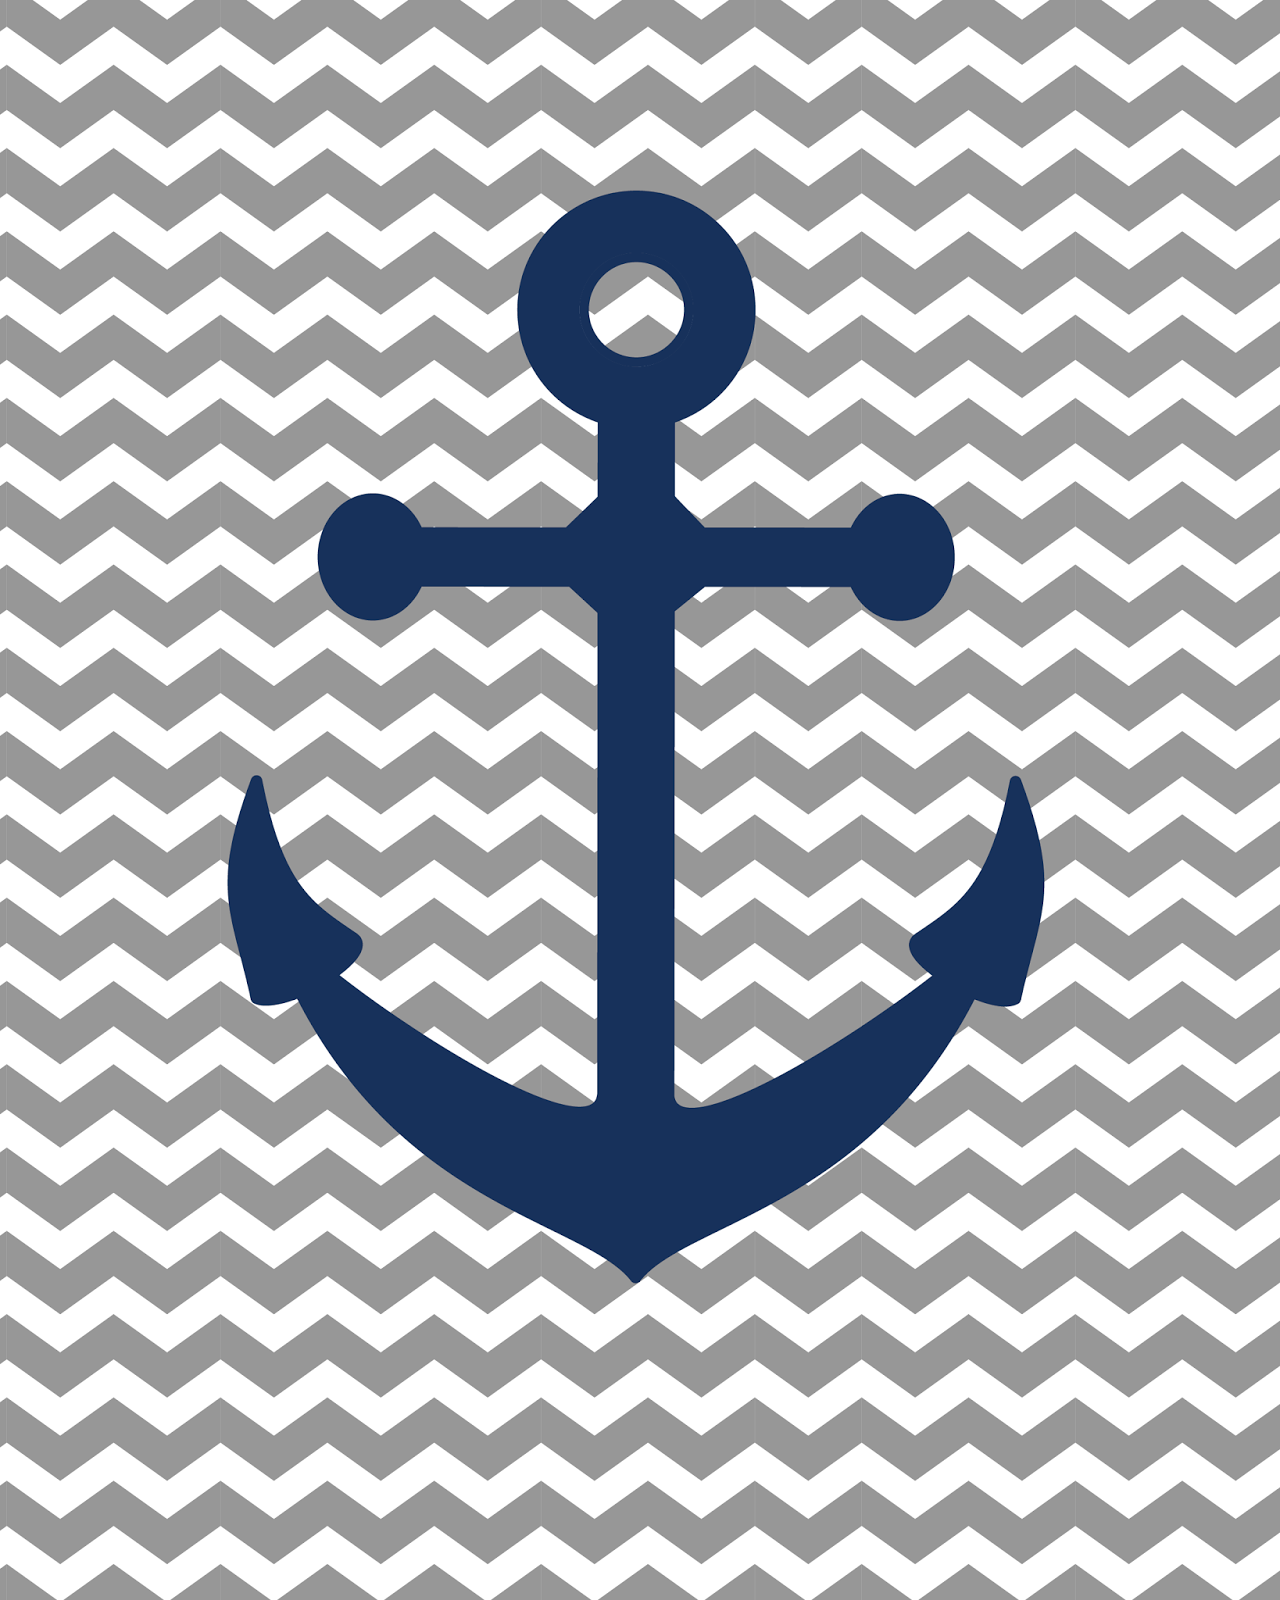 free background clipart | Church | Pinterest | Clip art, Anchors ...